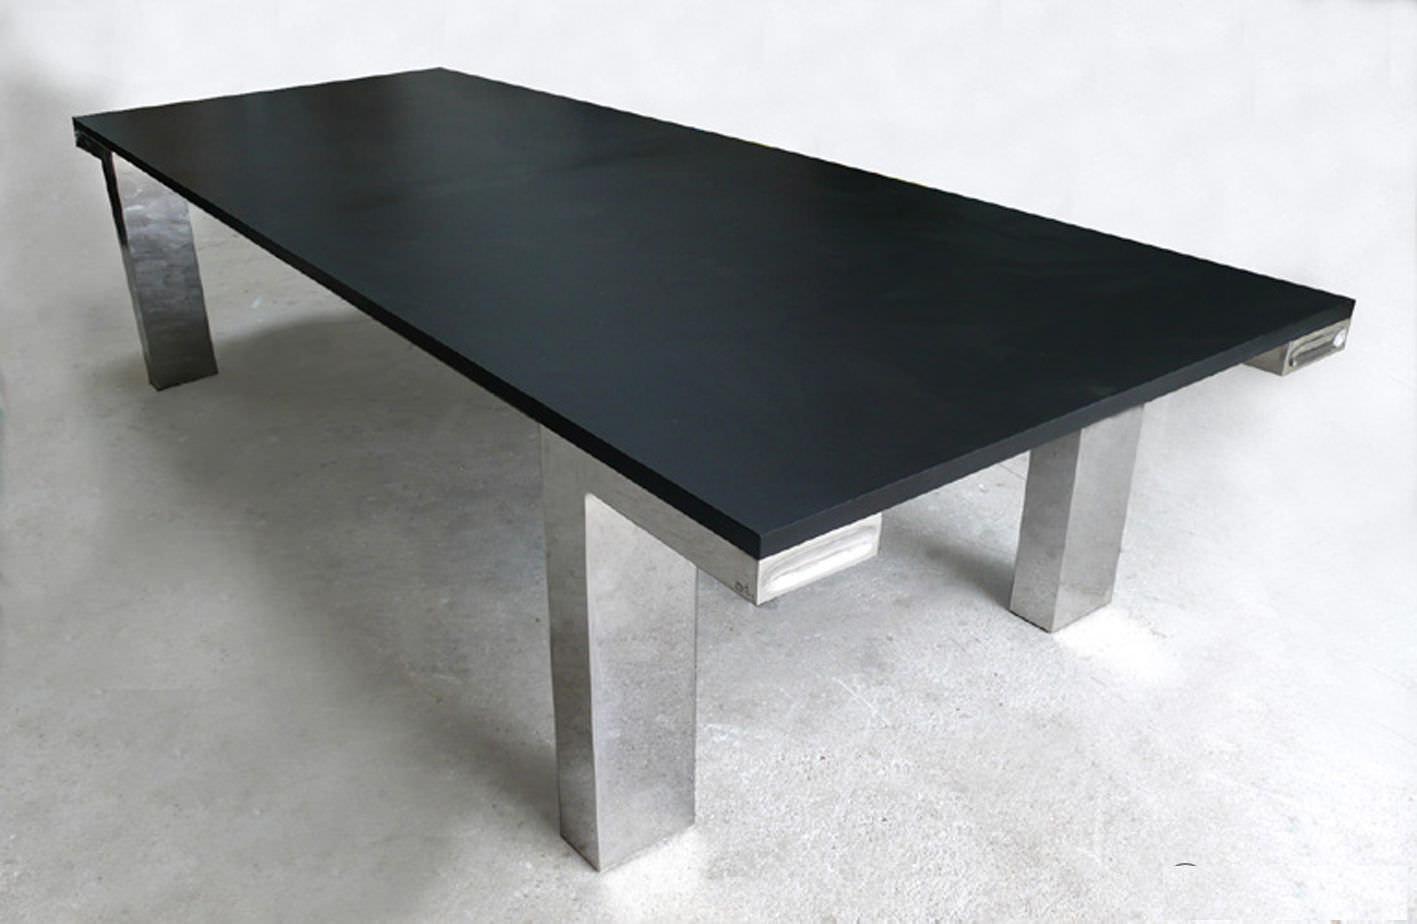 Piano per tavolo in pietra naturale - .LIGTHWEIGHT STONE : SLATE ...